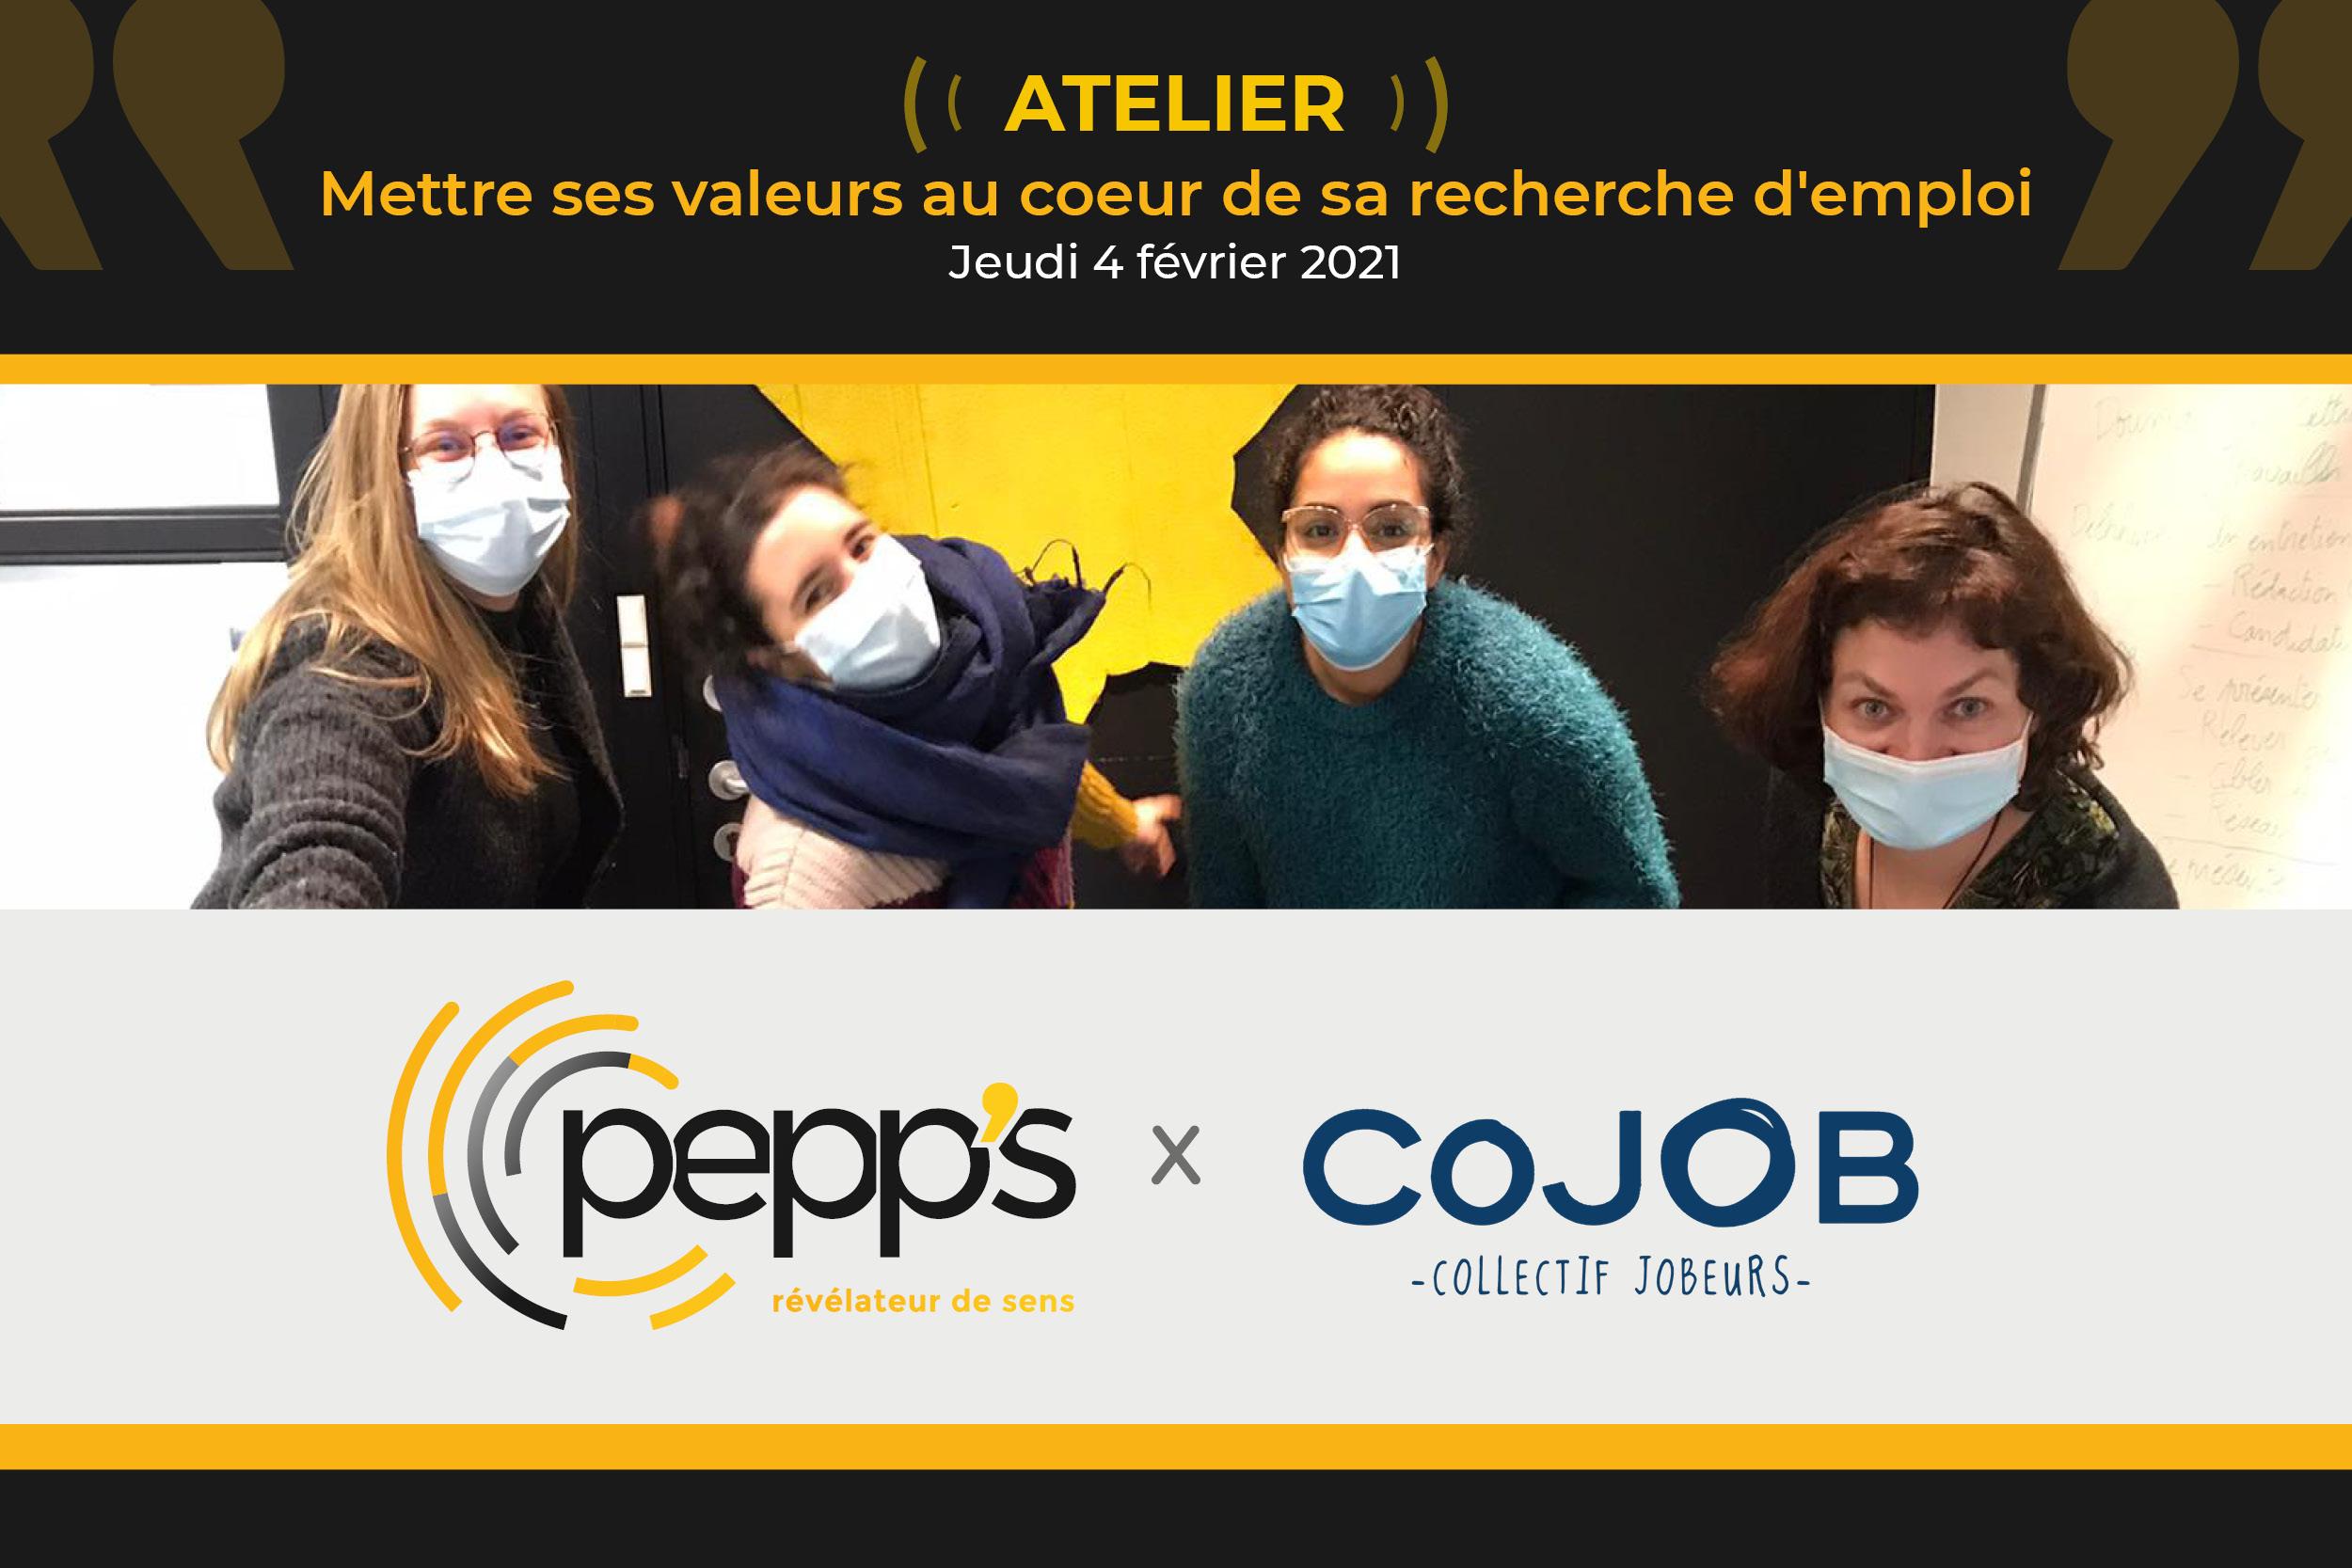 atelier valeurs pepps cojob